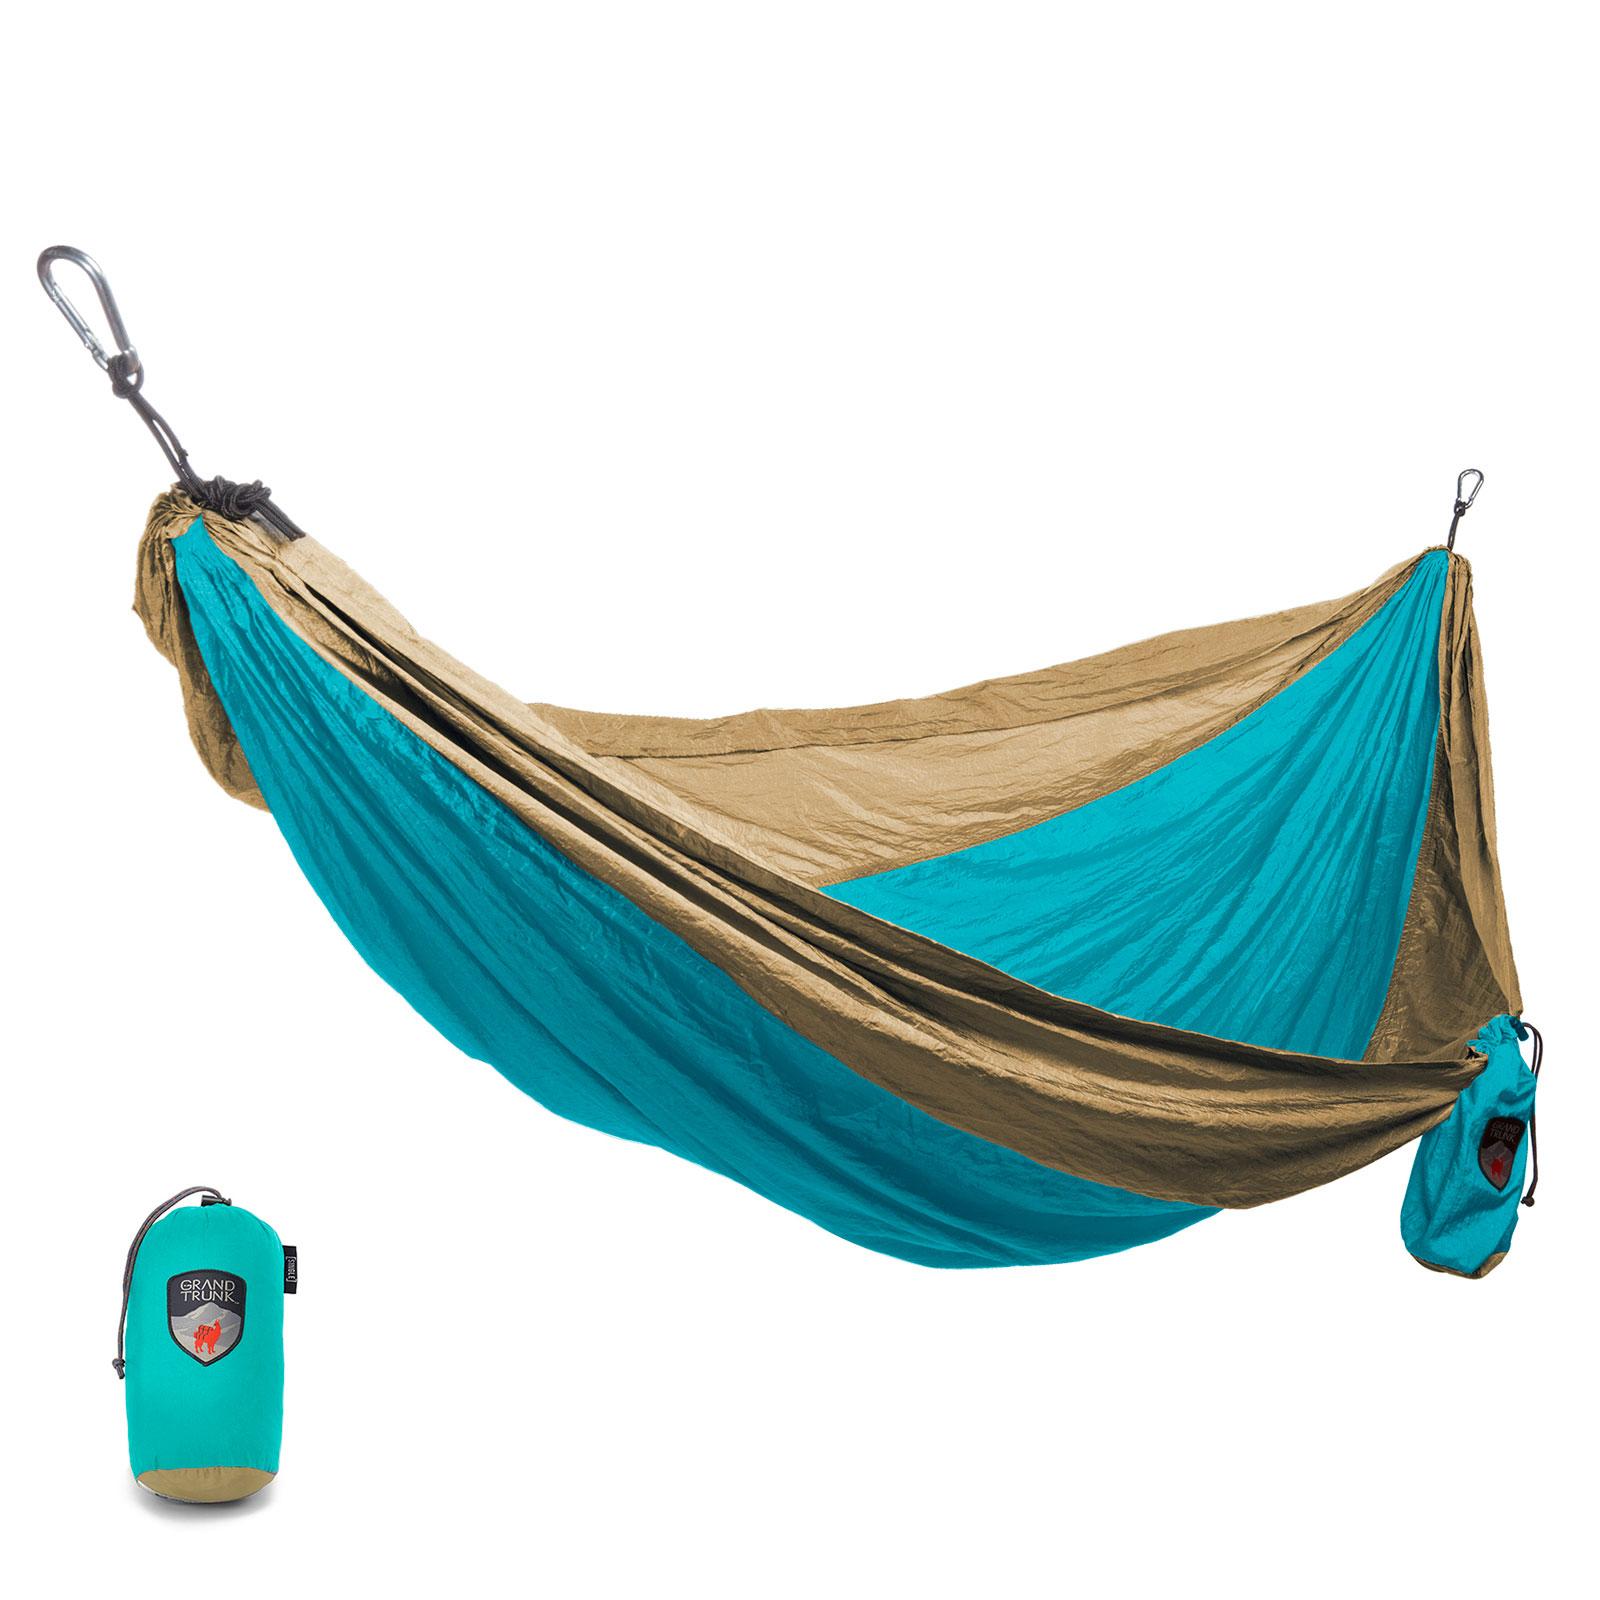 Grand Trunk Single Parachute Nylon Hammock Outdoor Camping Travel